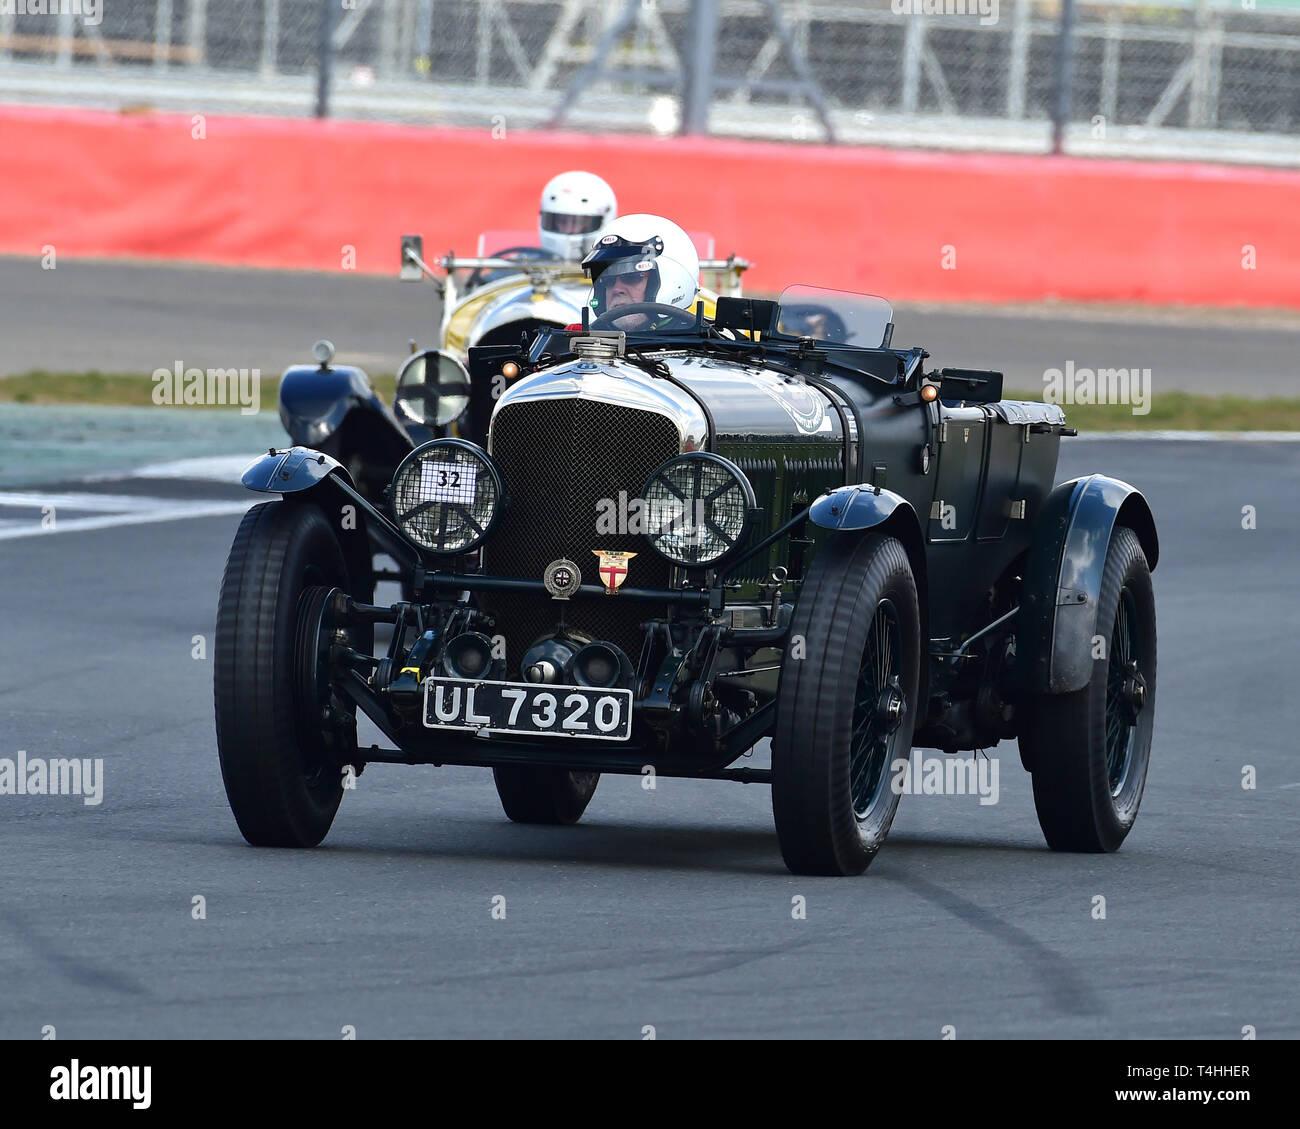 Martin Gaensler, Bentley Speed Six Le Mans, Benjafield 100, 100 Years of Bentley, April 2019,  Silverstone, Northamptonshire, England, circuit racing, - Stock Image